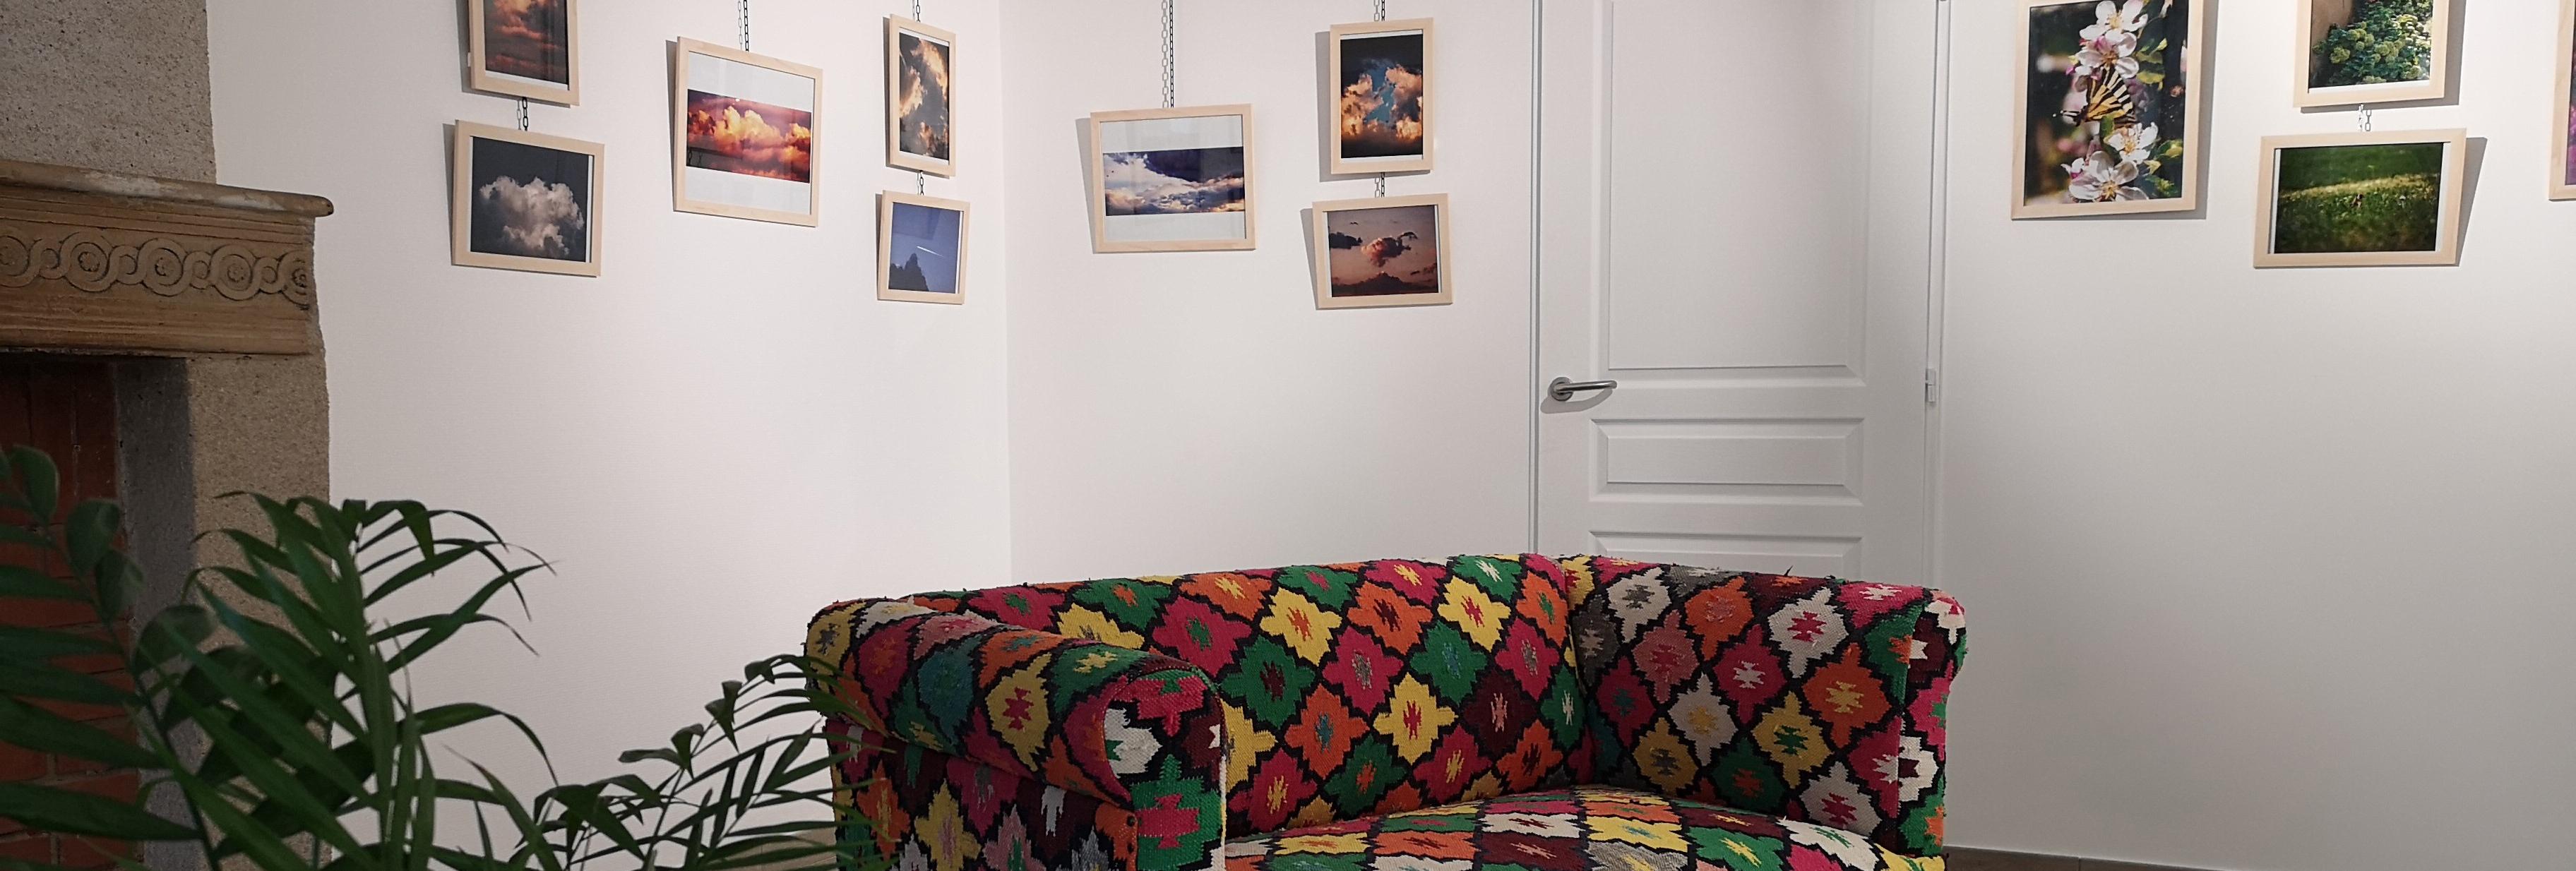 <i class='fa fa-camera' aria-hidden='true'></i> Salle d'exposition © LIMOUSIN